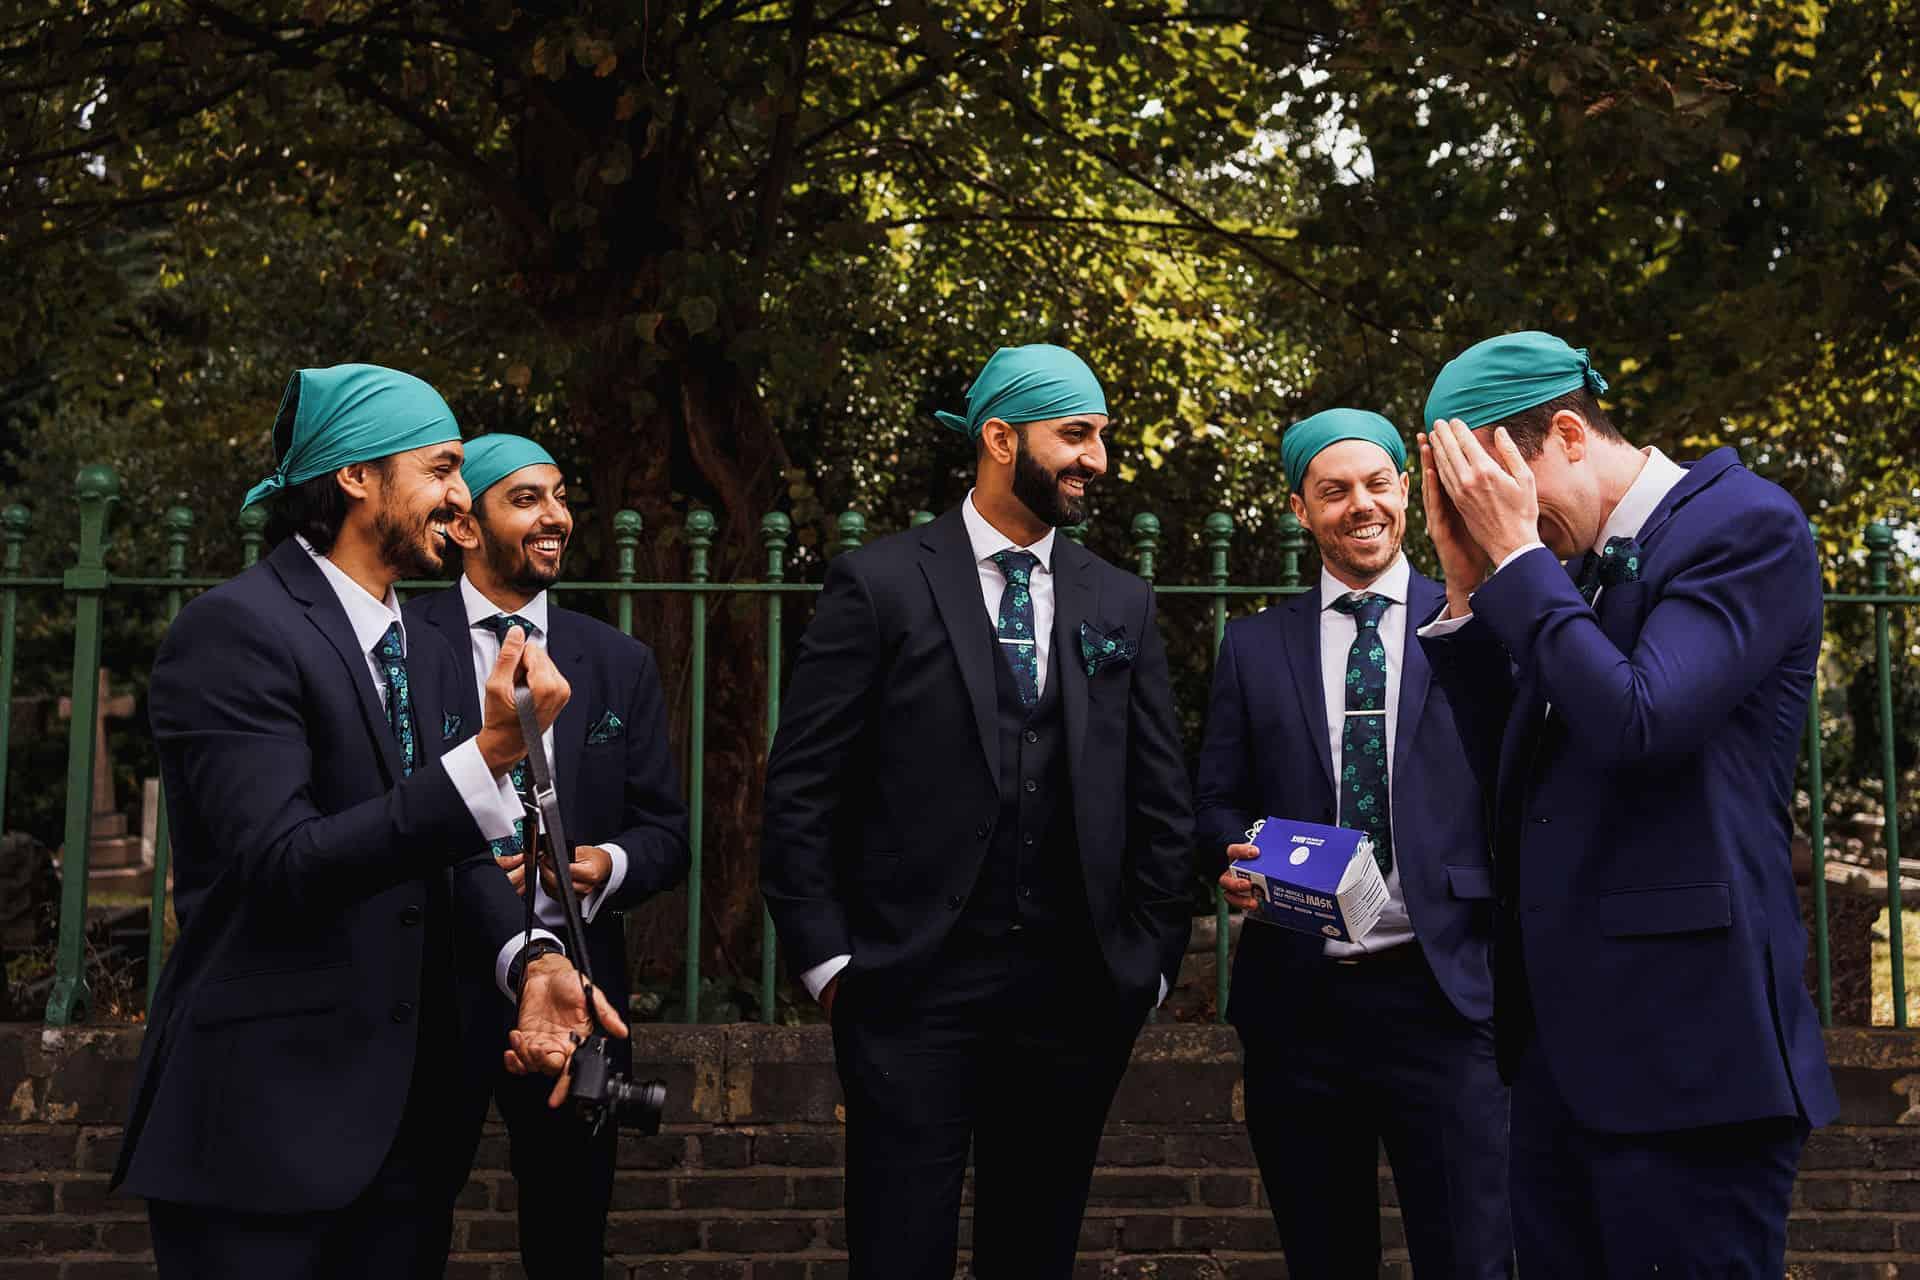 best london wedding photography 2020